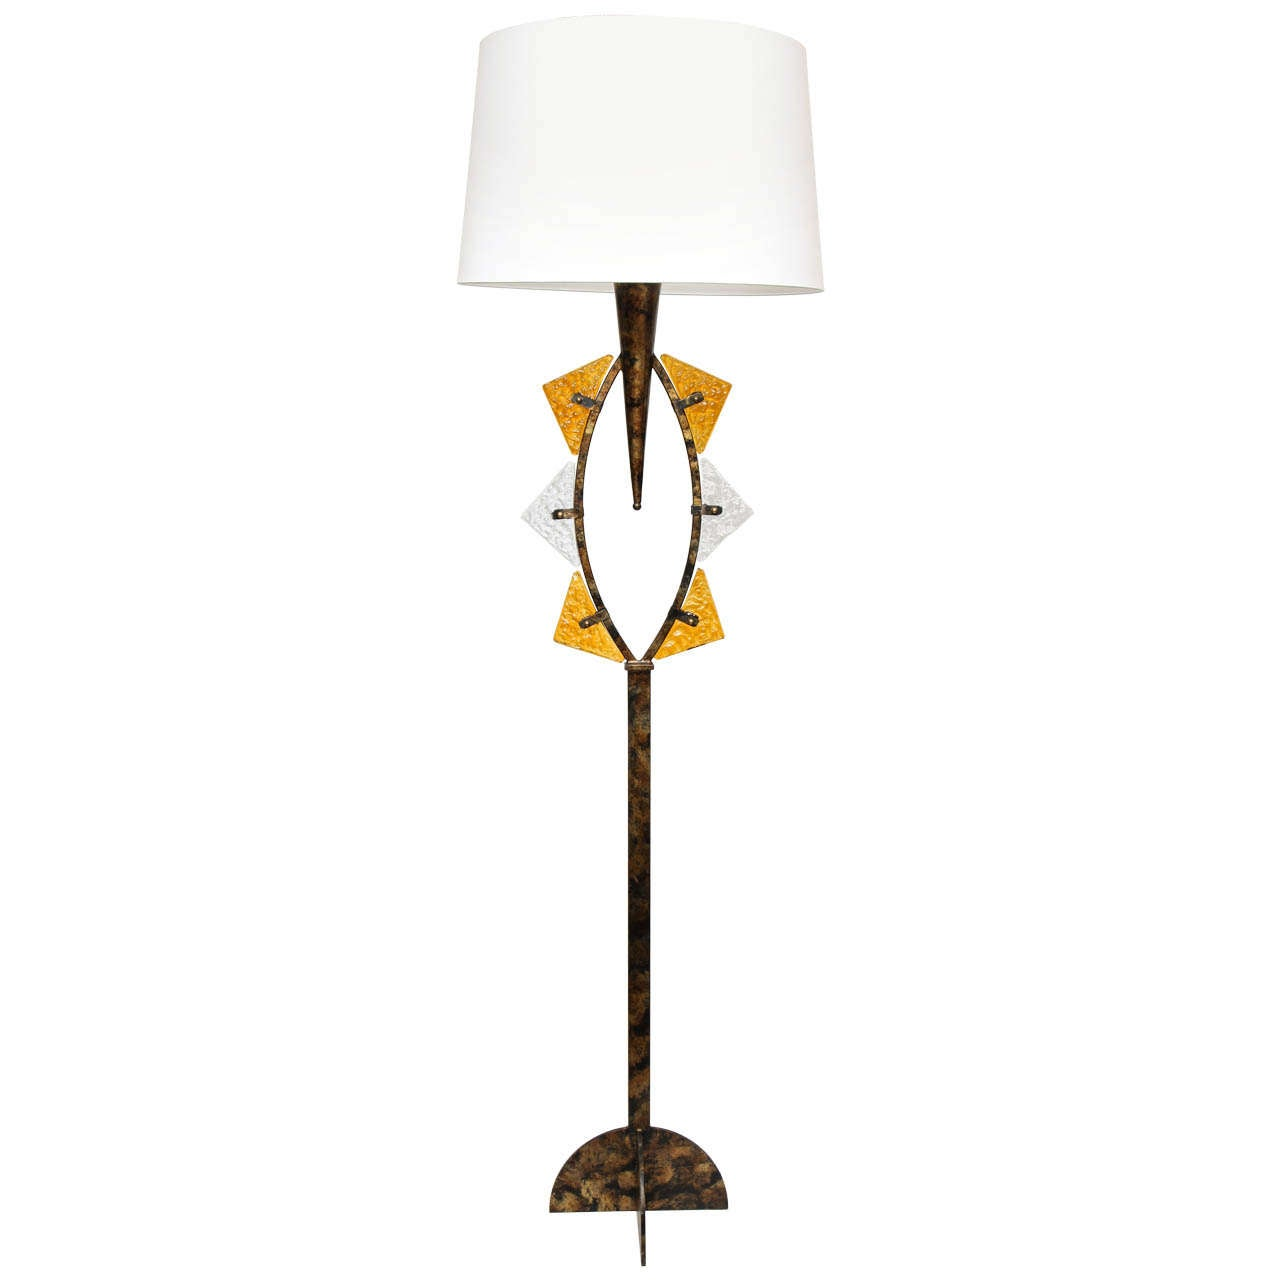 Mid Century Modern Italian Brutalist Floor Lamp 1960's